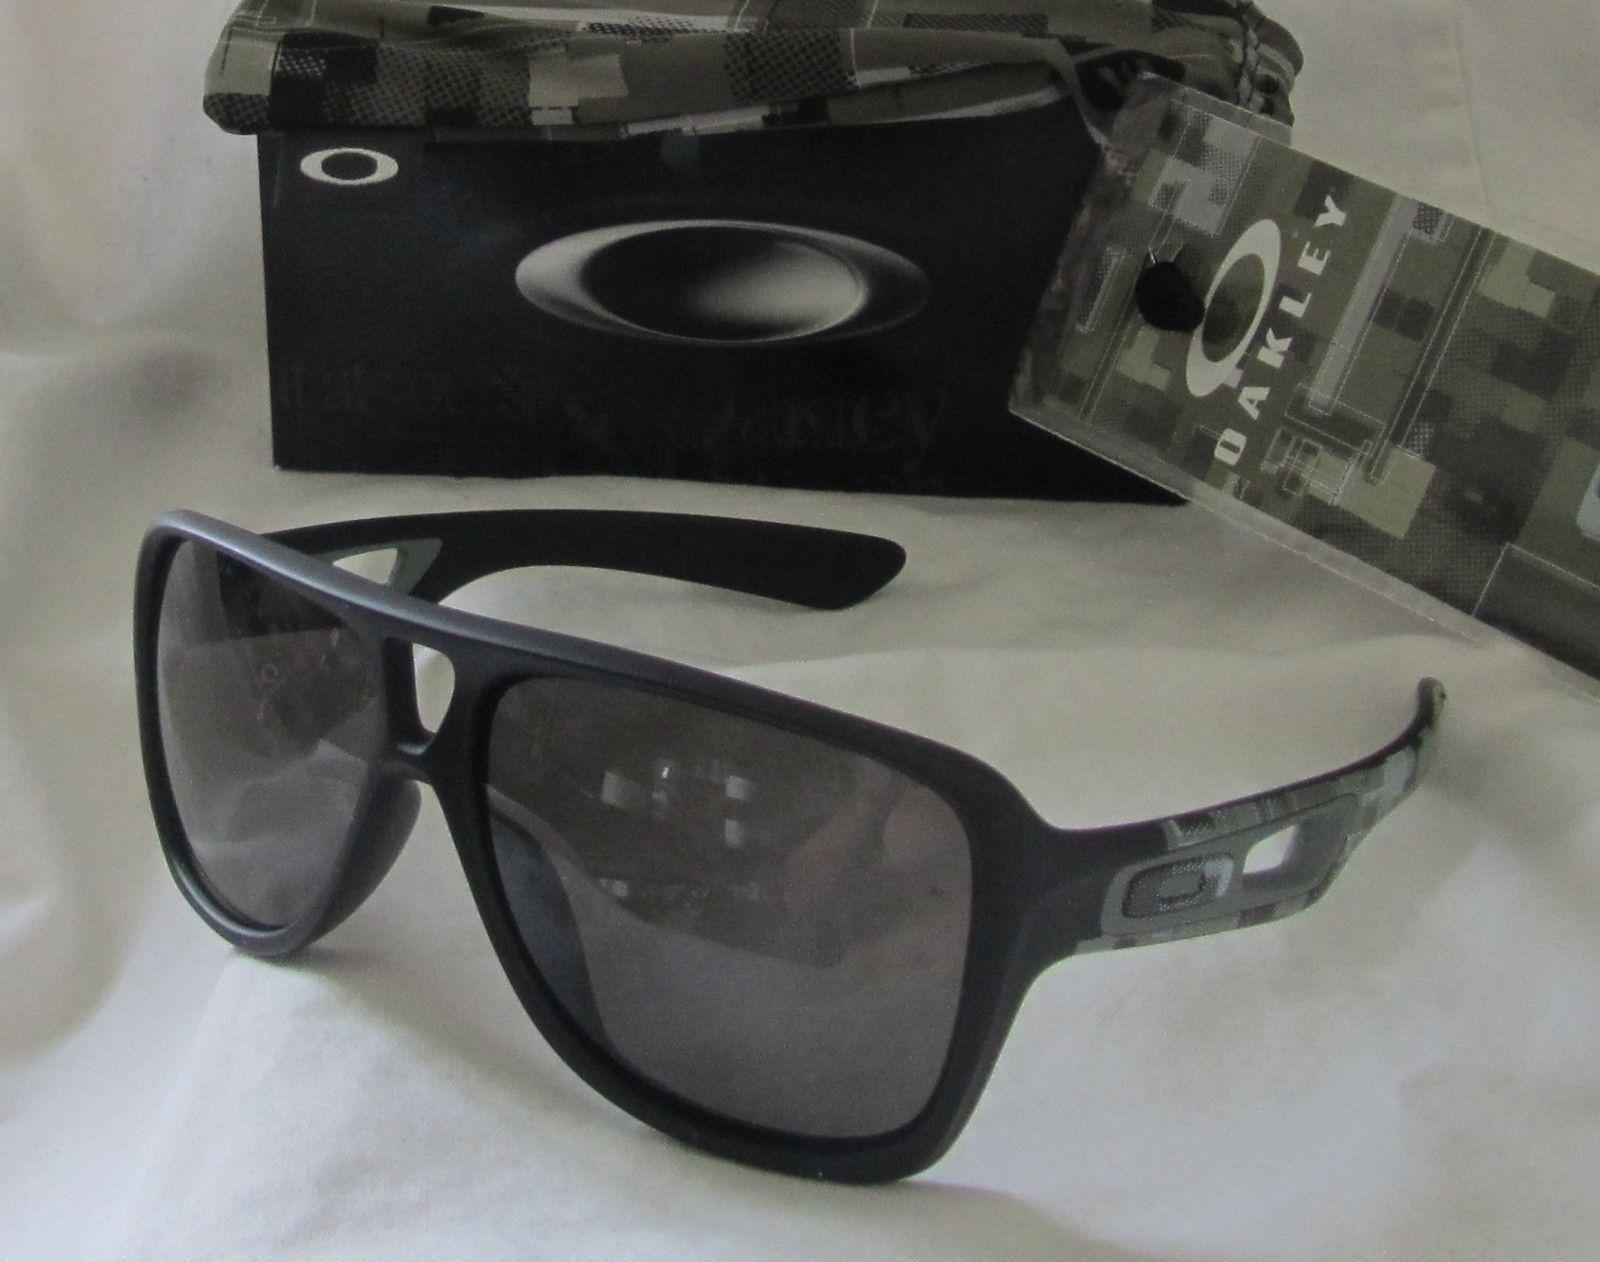 GP 75 Dispatch 2, Black / Warm Grey 10/10 Limited Edition Authentic - dispatch02.jpg